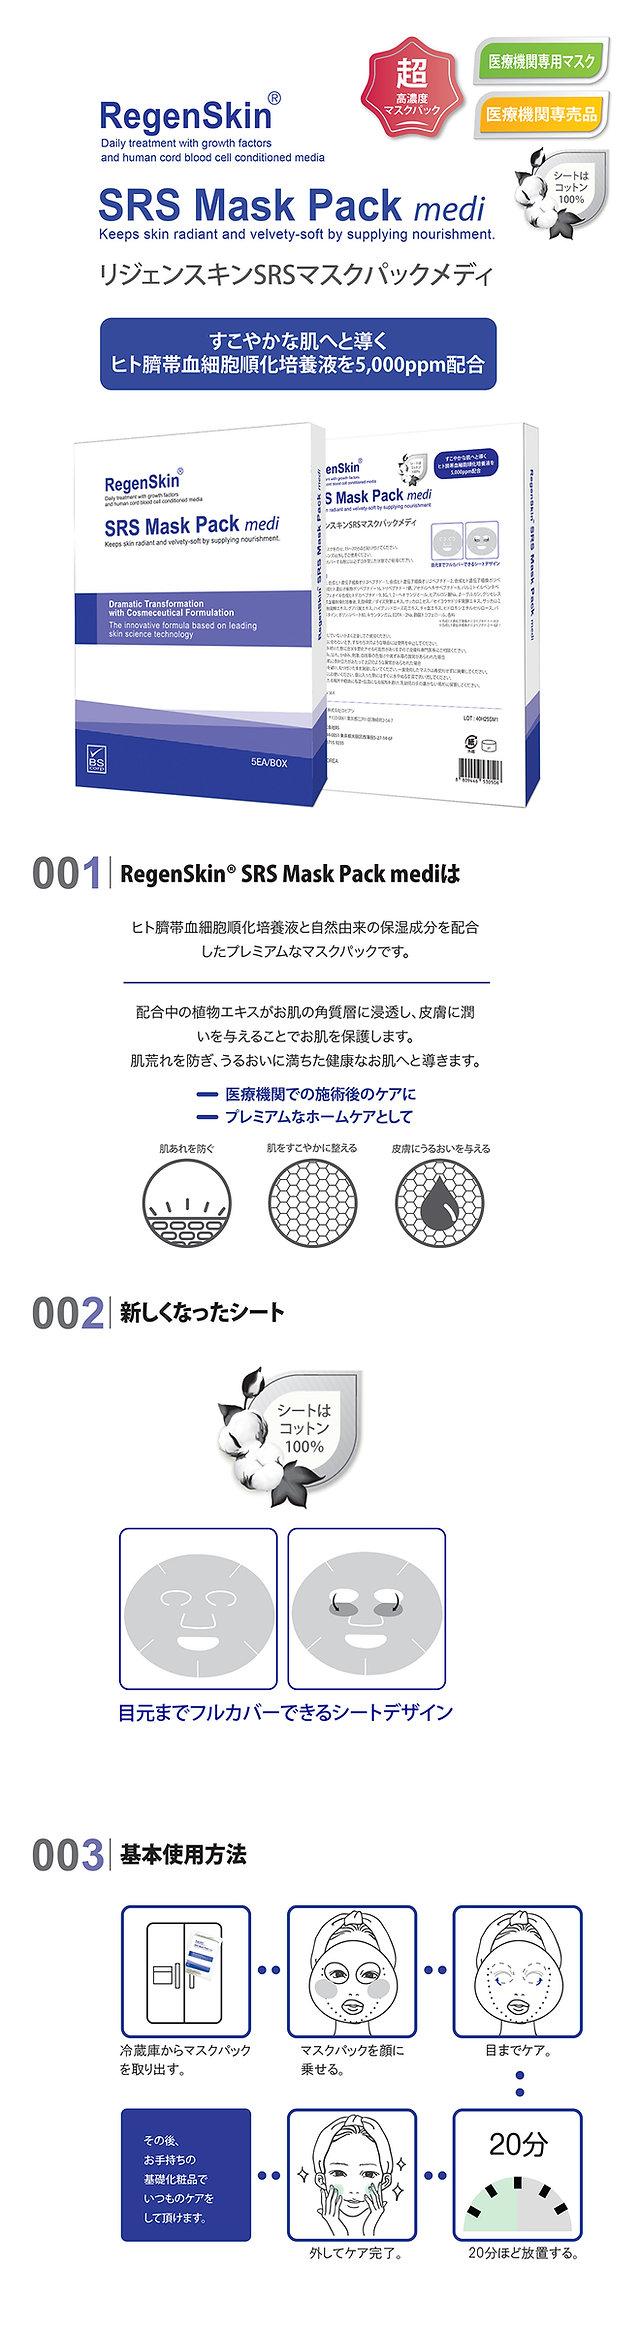 RegenSkin-medi-2020-1.jpg